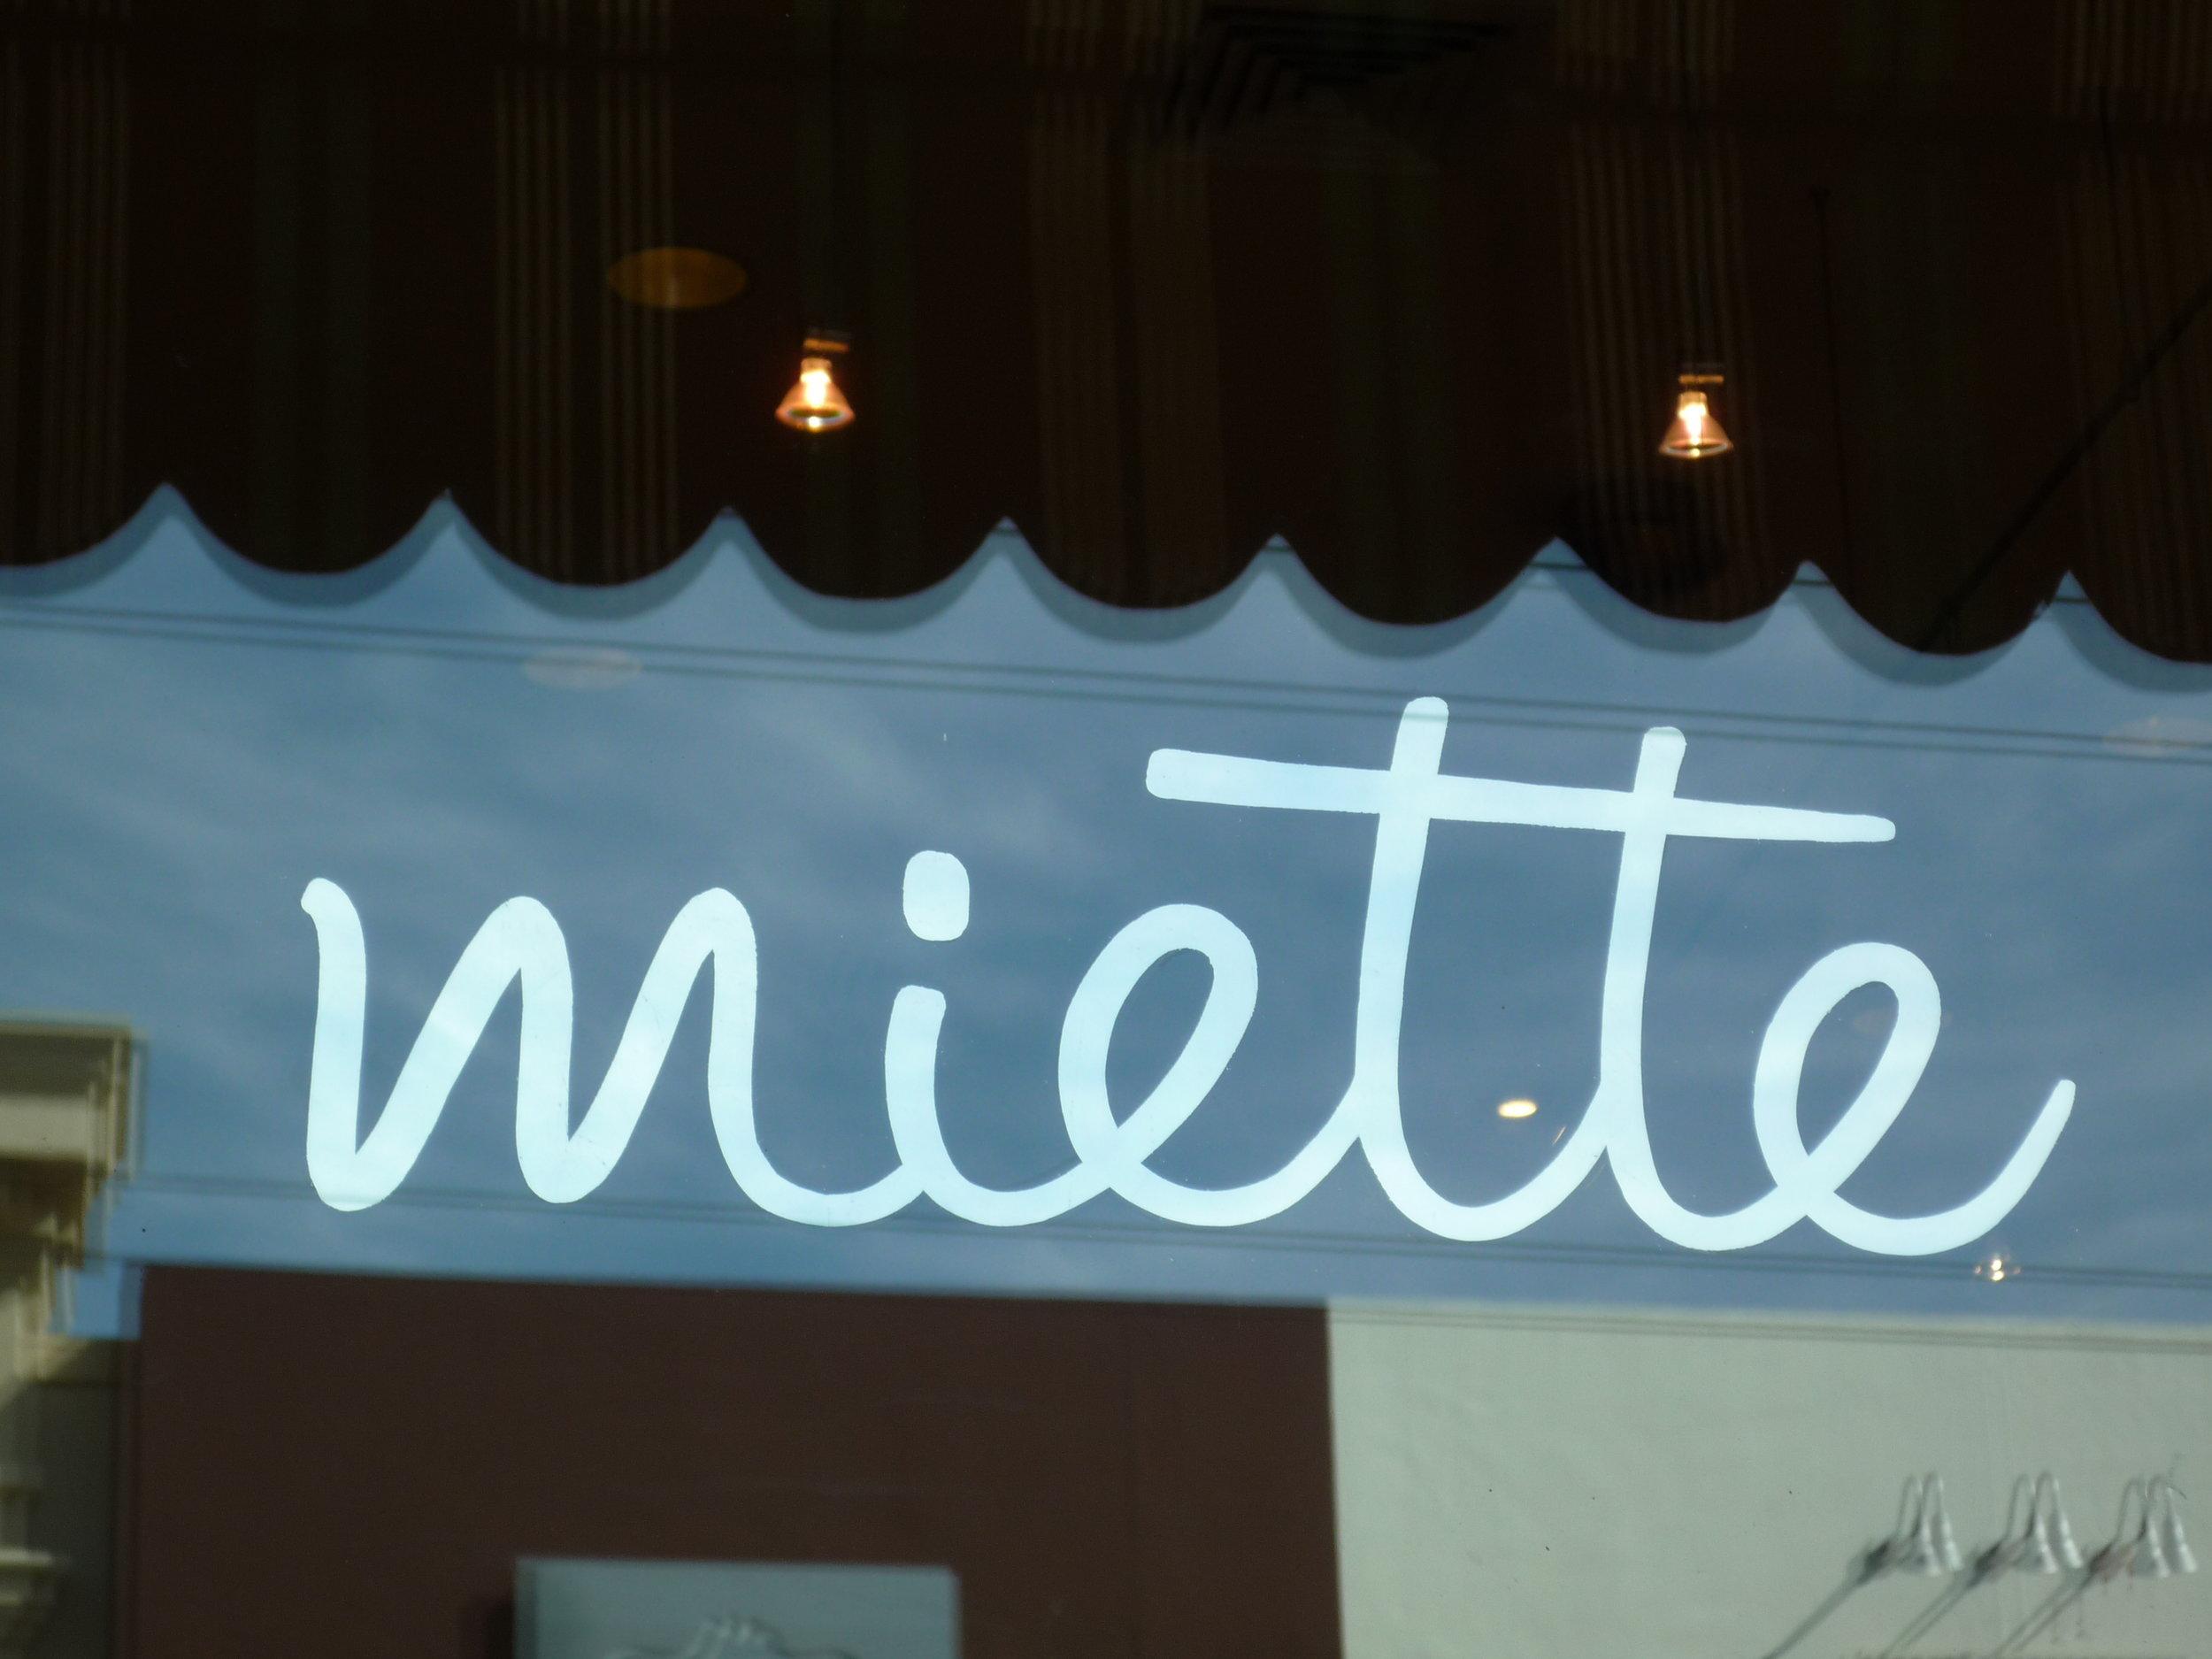 GOLD-miette-door-chestnut-street_3618617766_o.jpg